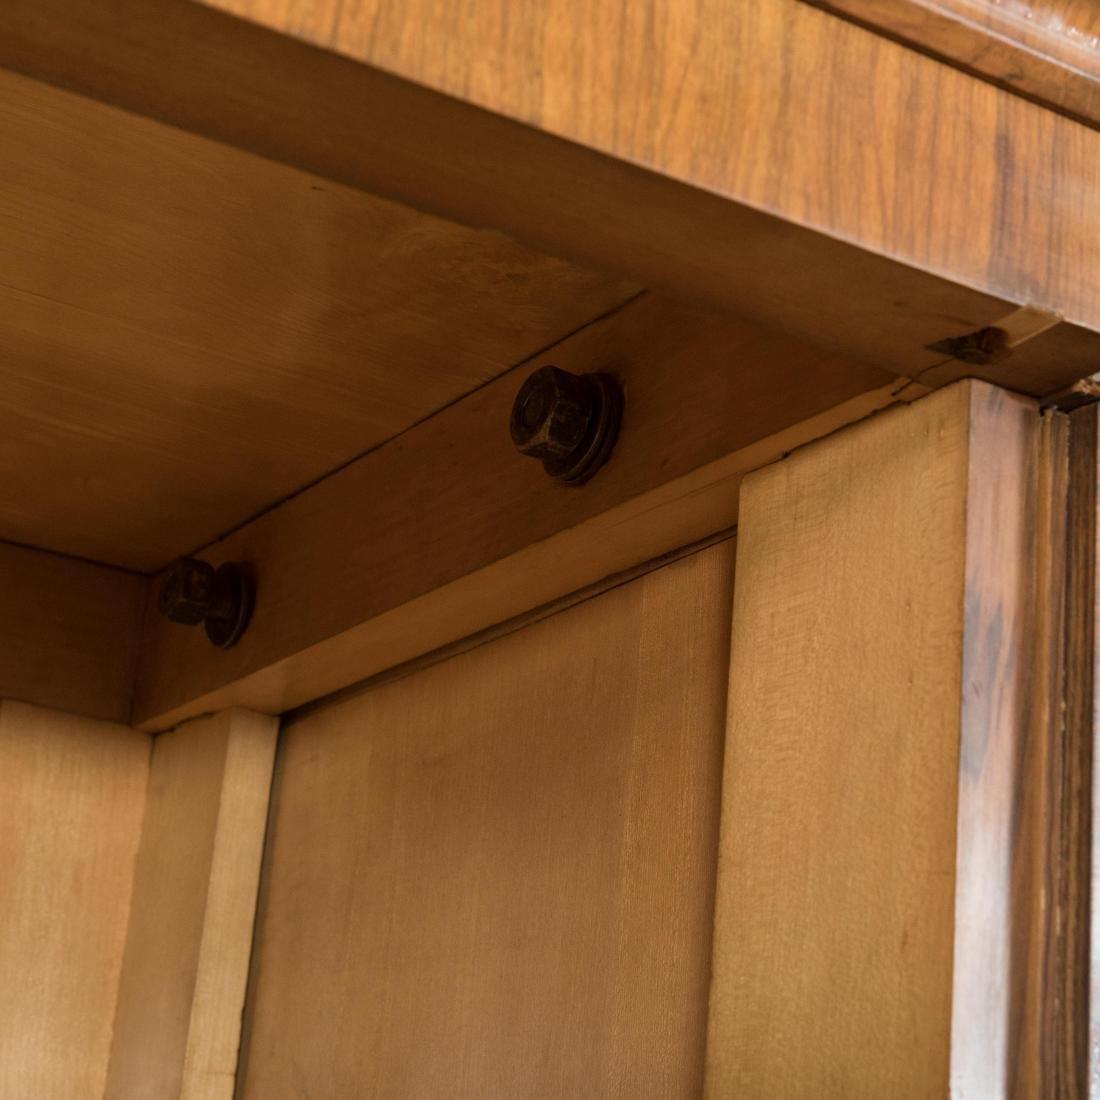 Burled English Art Deco Armoire - Epstein Brothers - 6